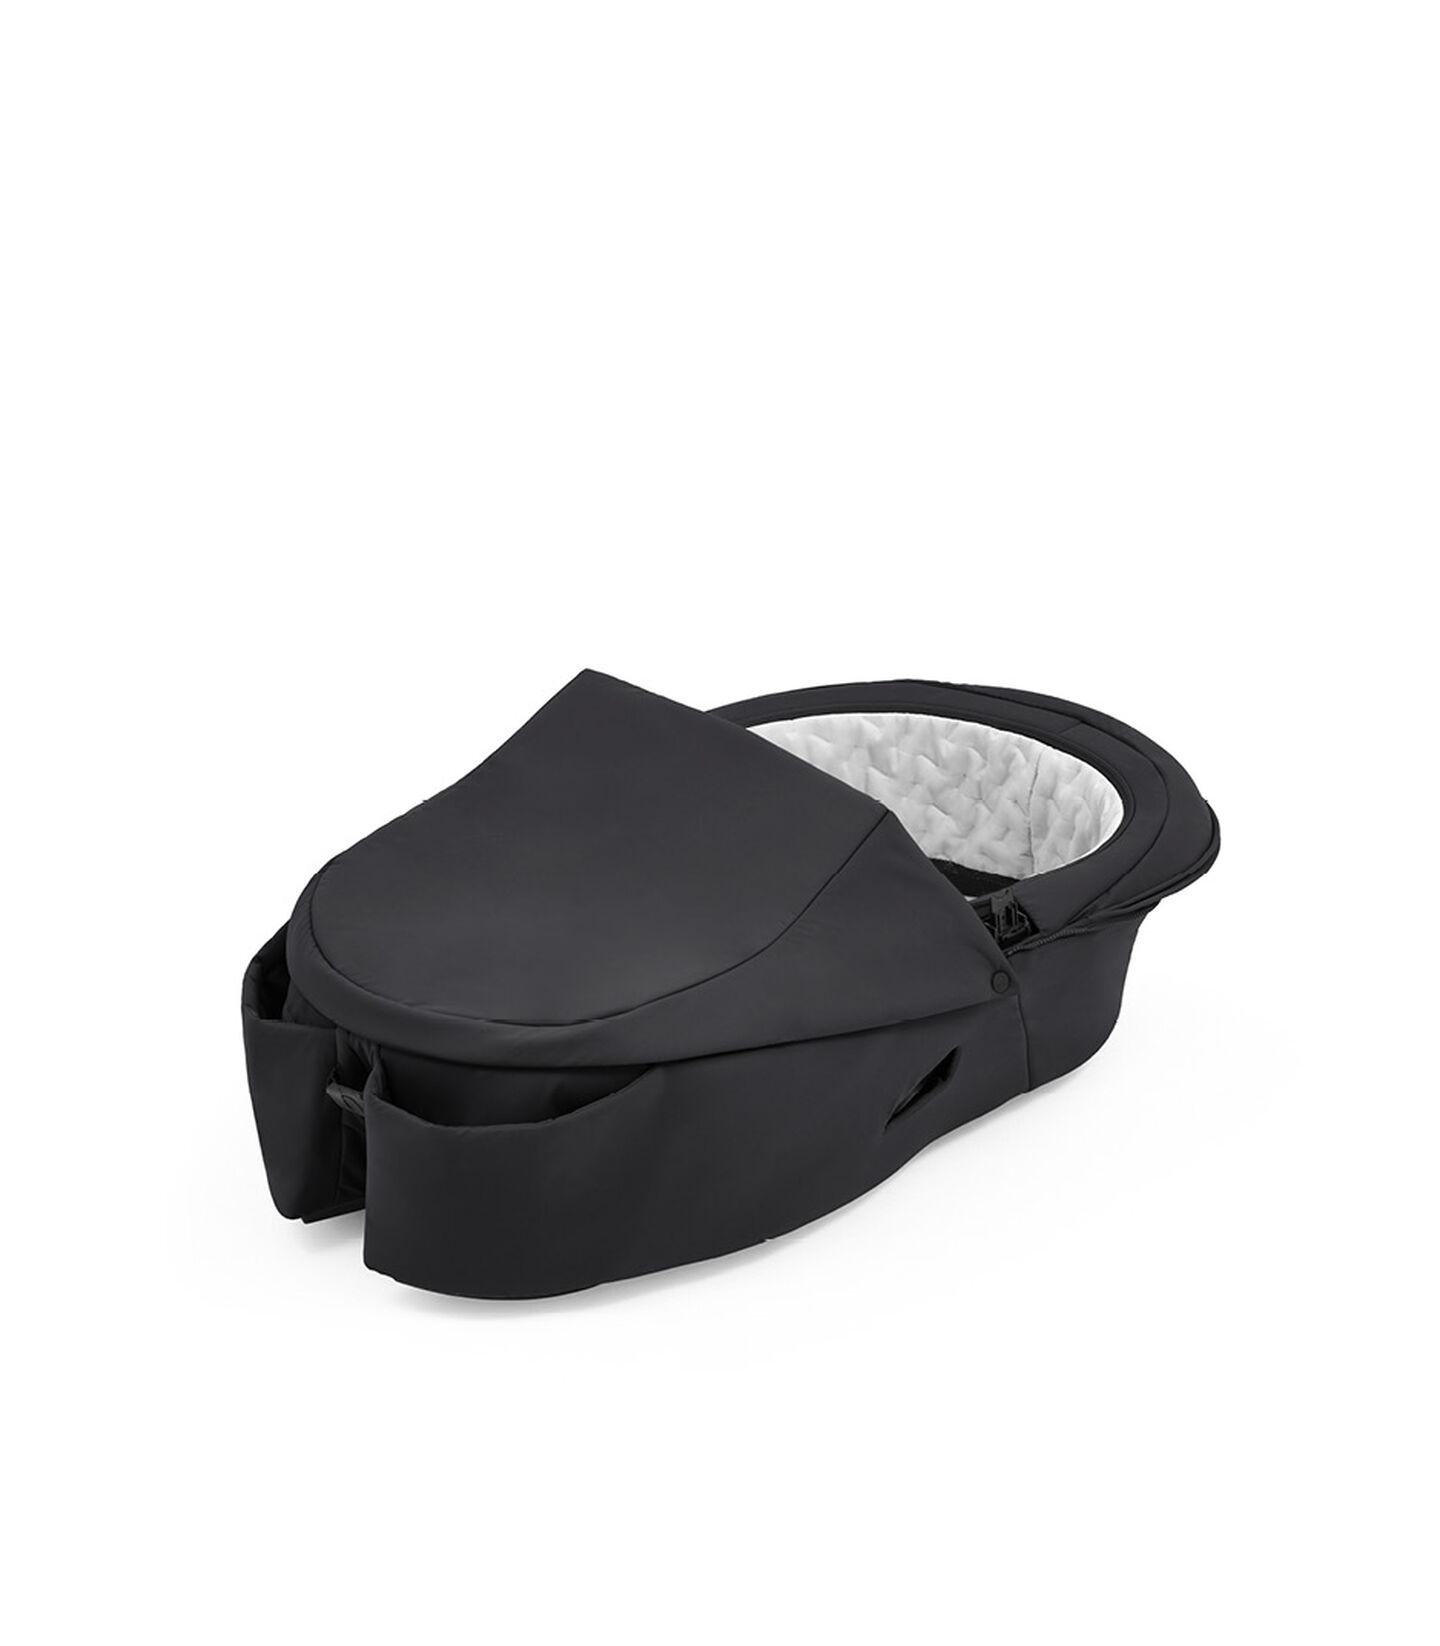 Stokke® Xplory® X Rich Black Carry Cot, no canopy. view 1